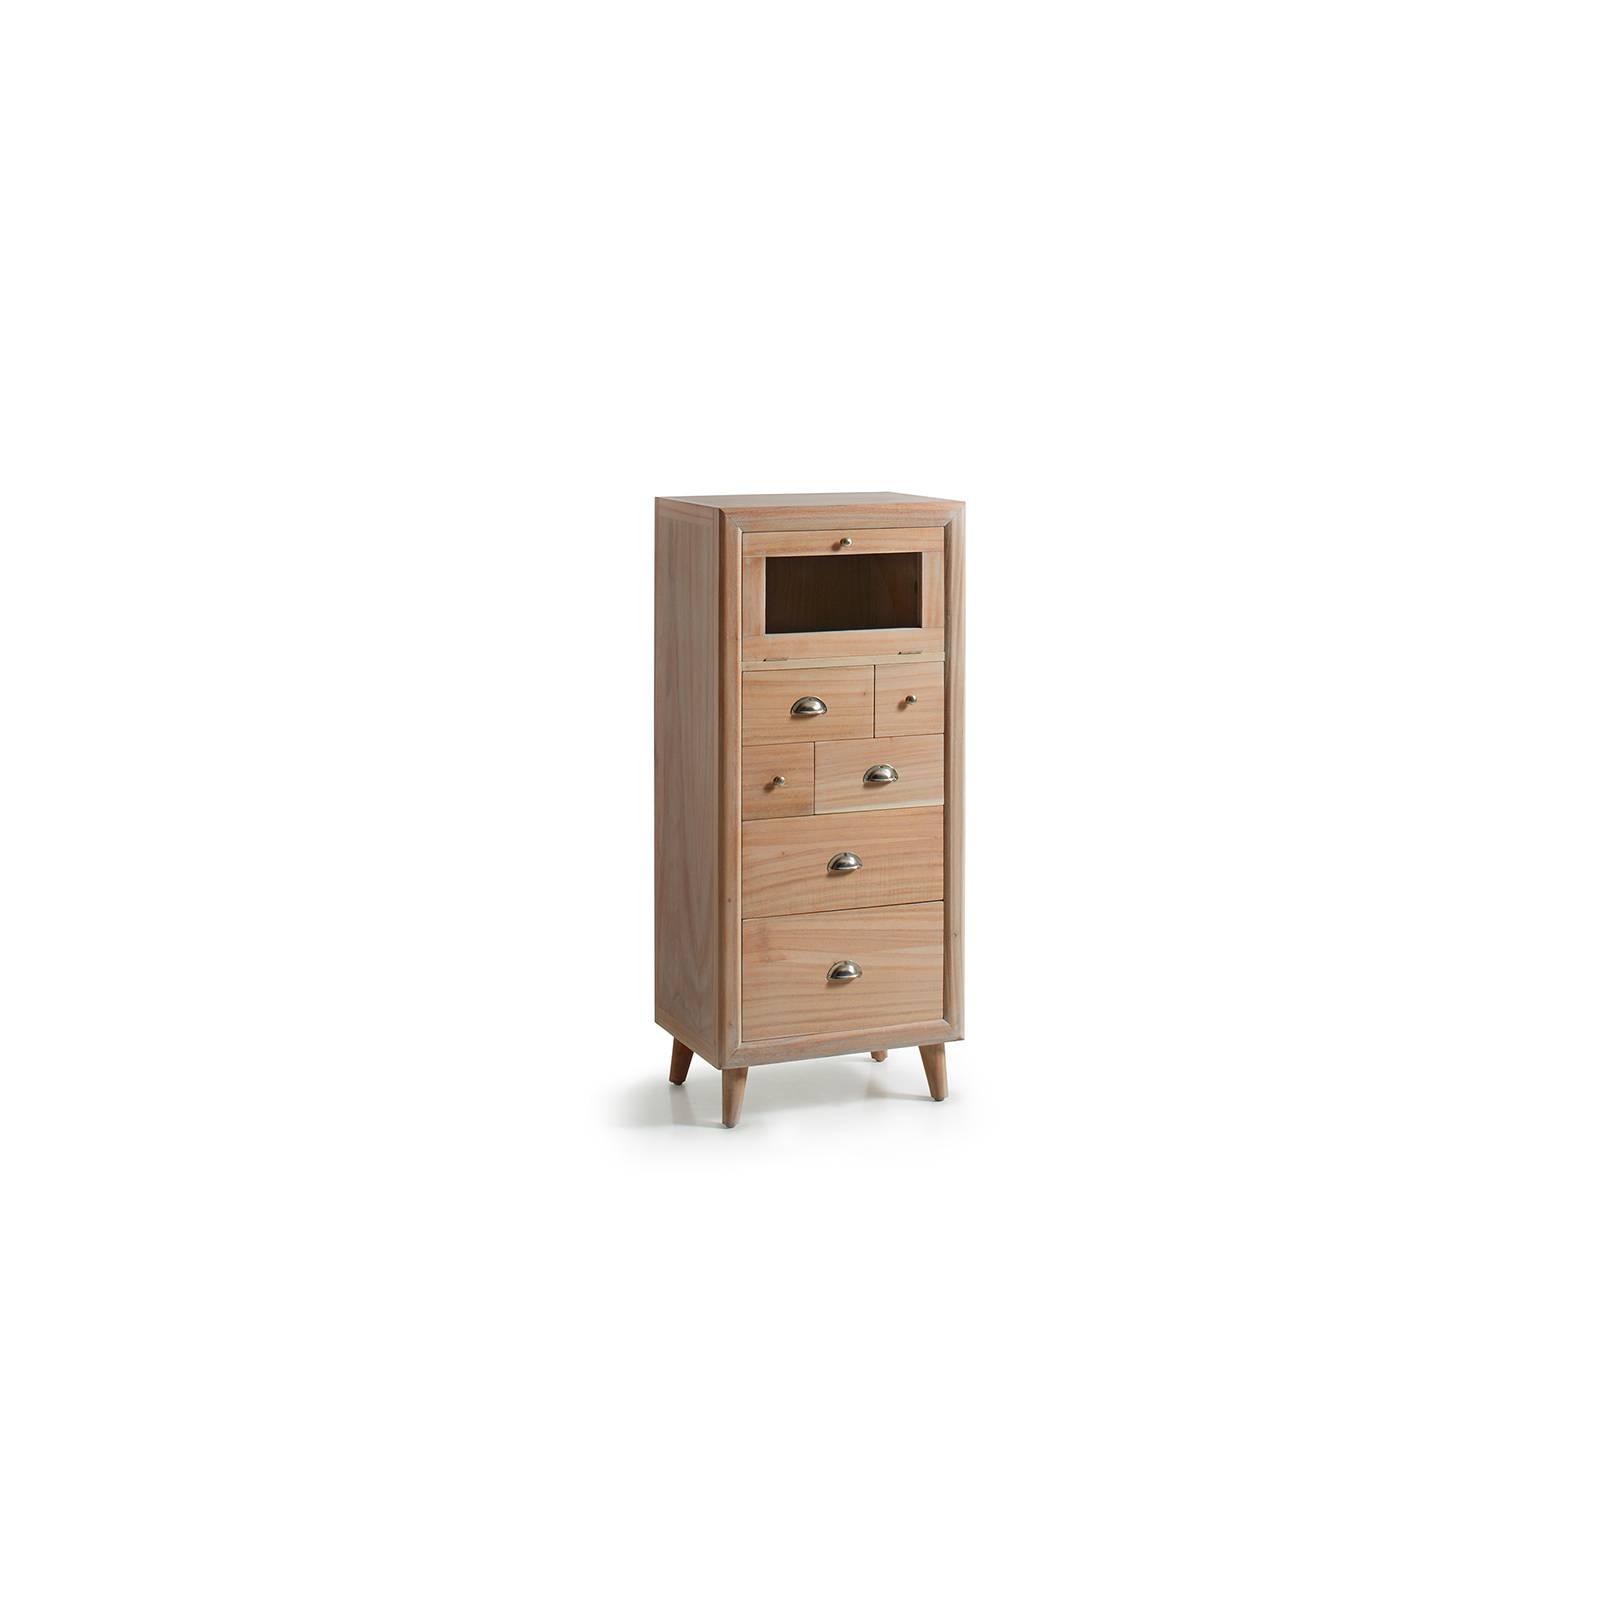 Chiffonnier Oslo Mindy - meubles scandinaves